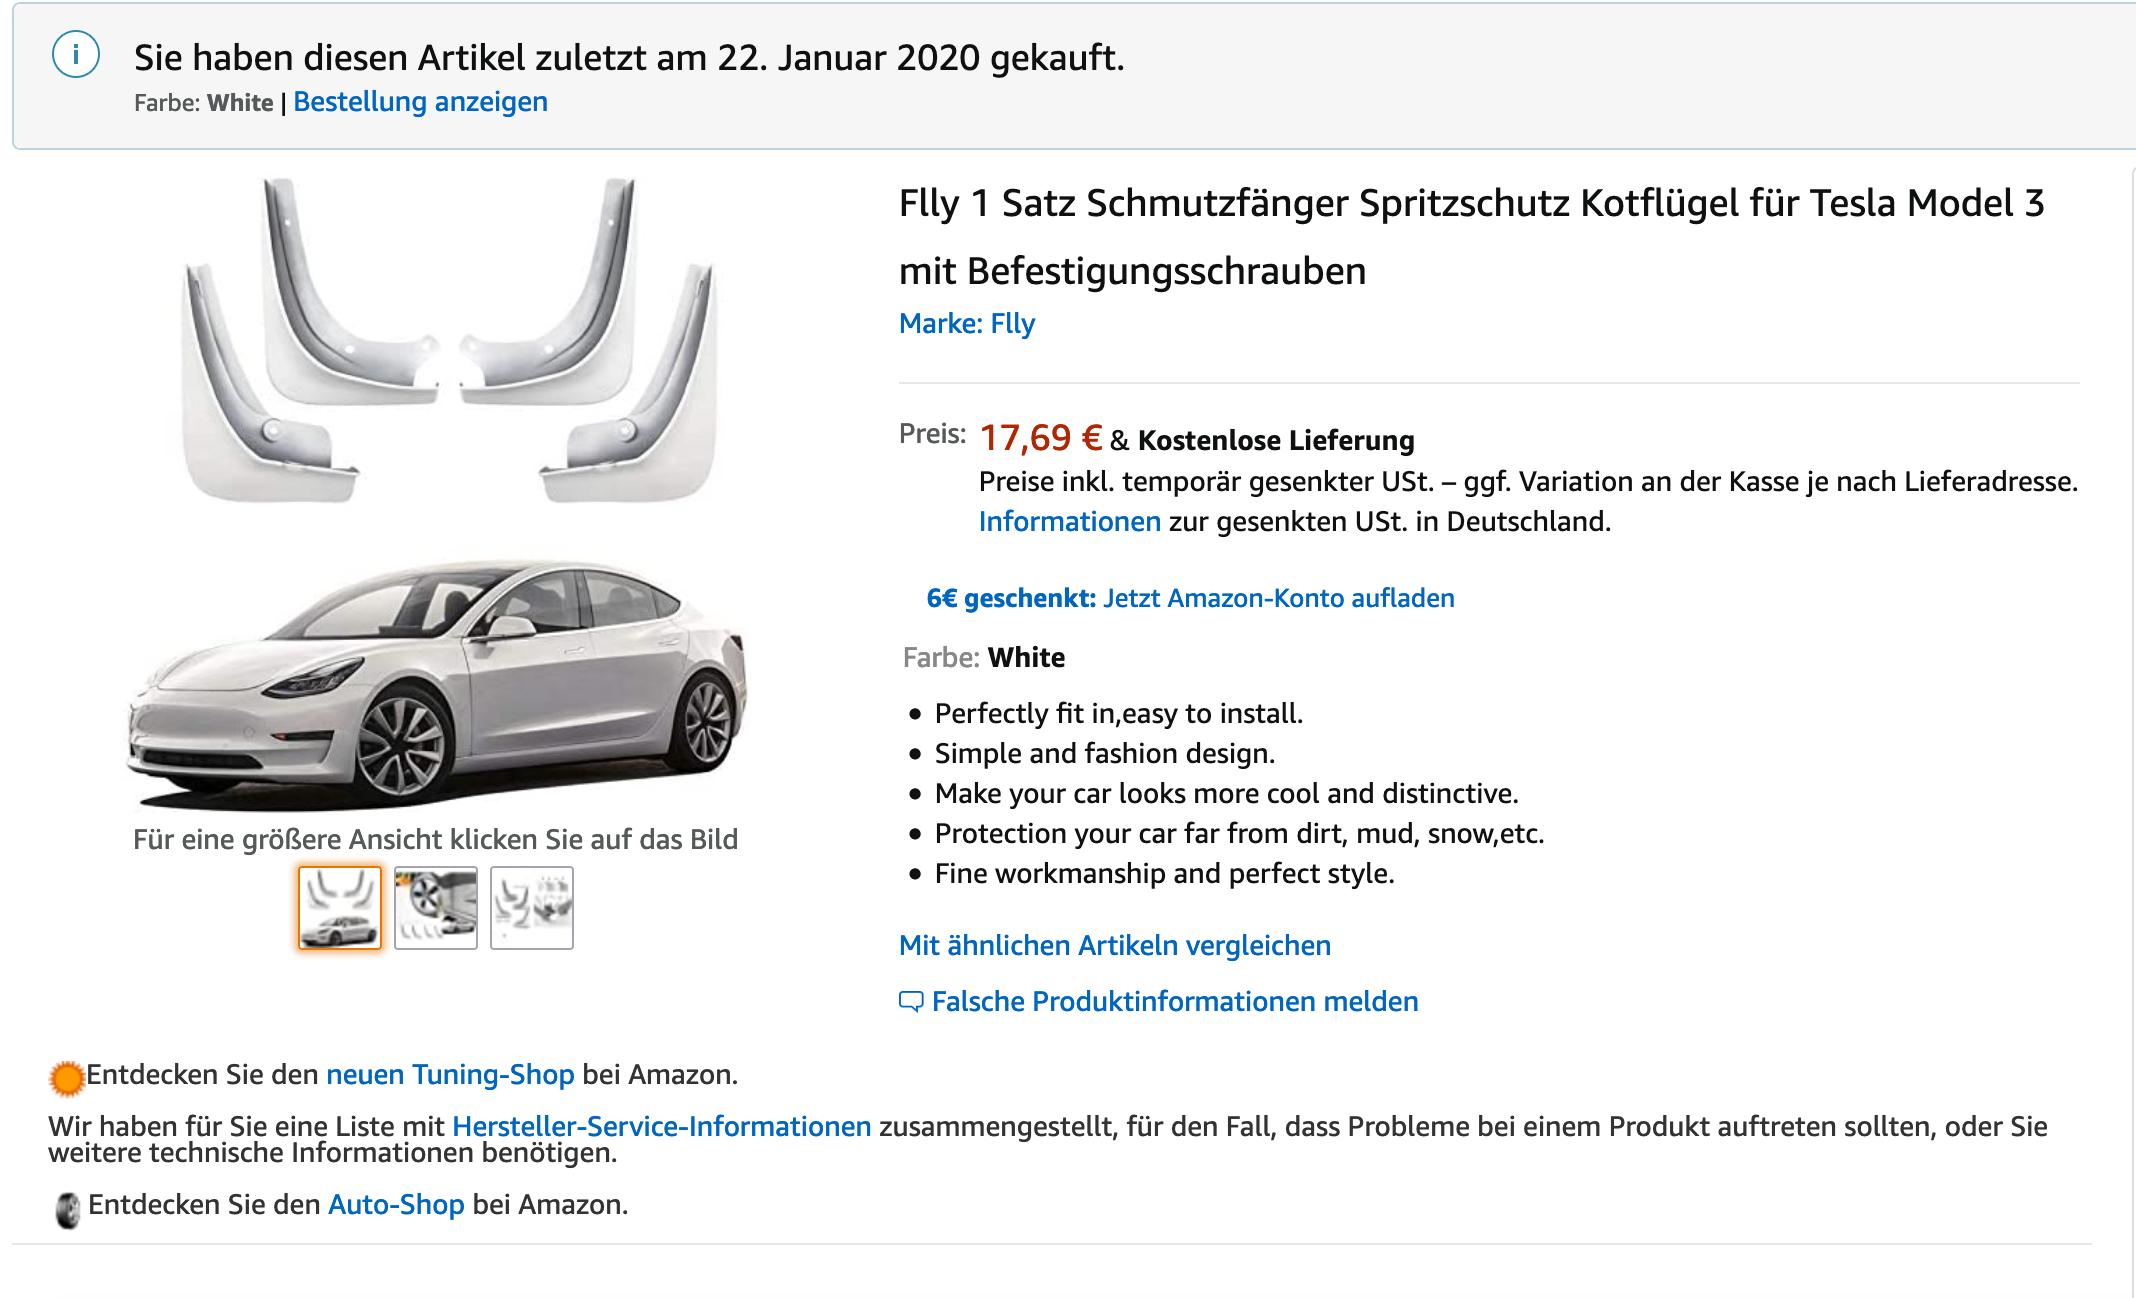 Jaronx Tesla Modell 3 Schmutzfnger Spritzschutz for Tesla Model 3 ...